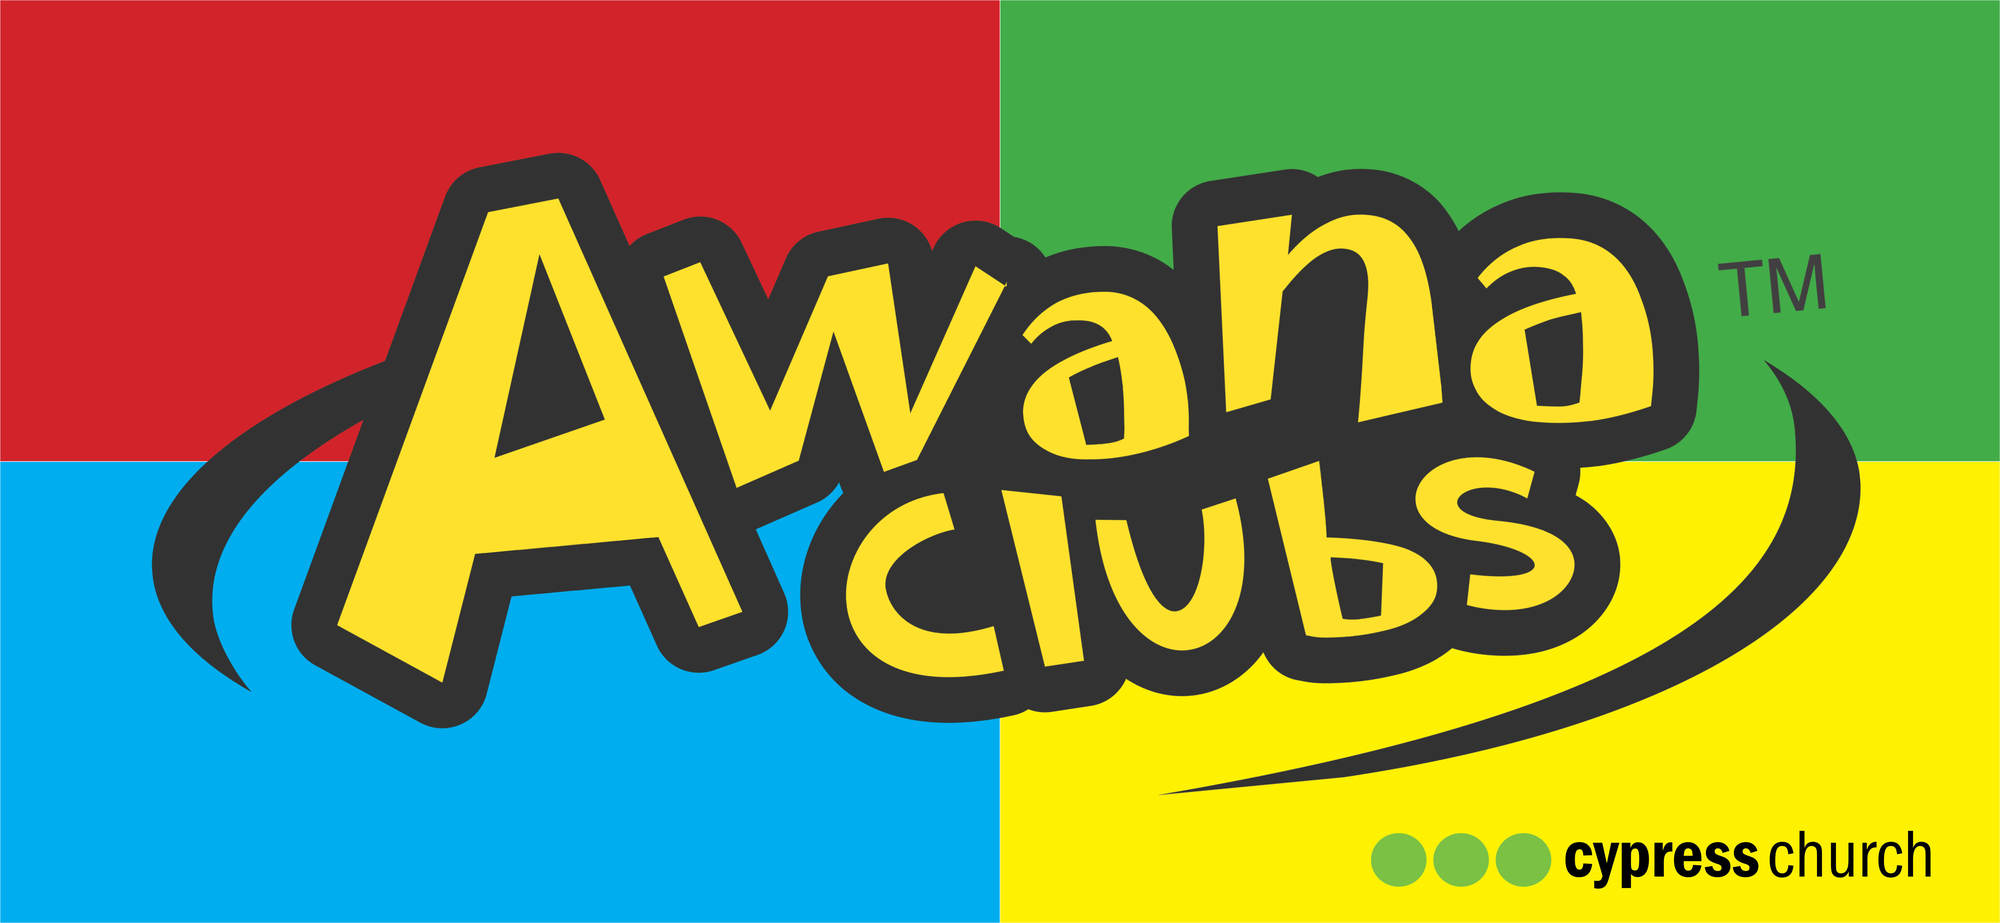 Cypress community church menu. Awana clipart flag